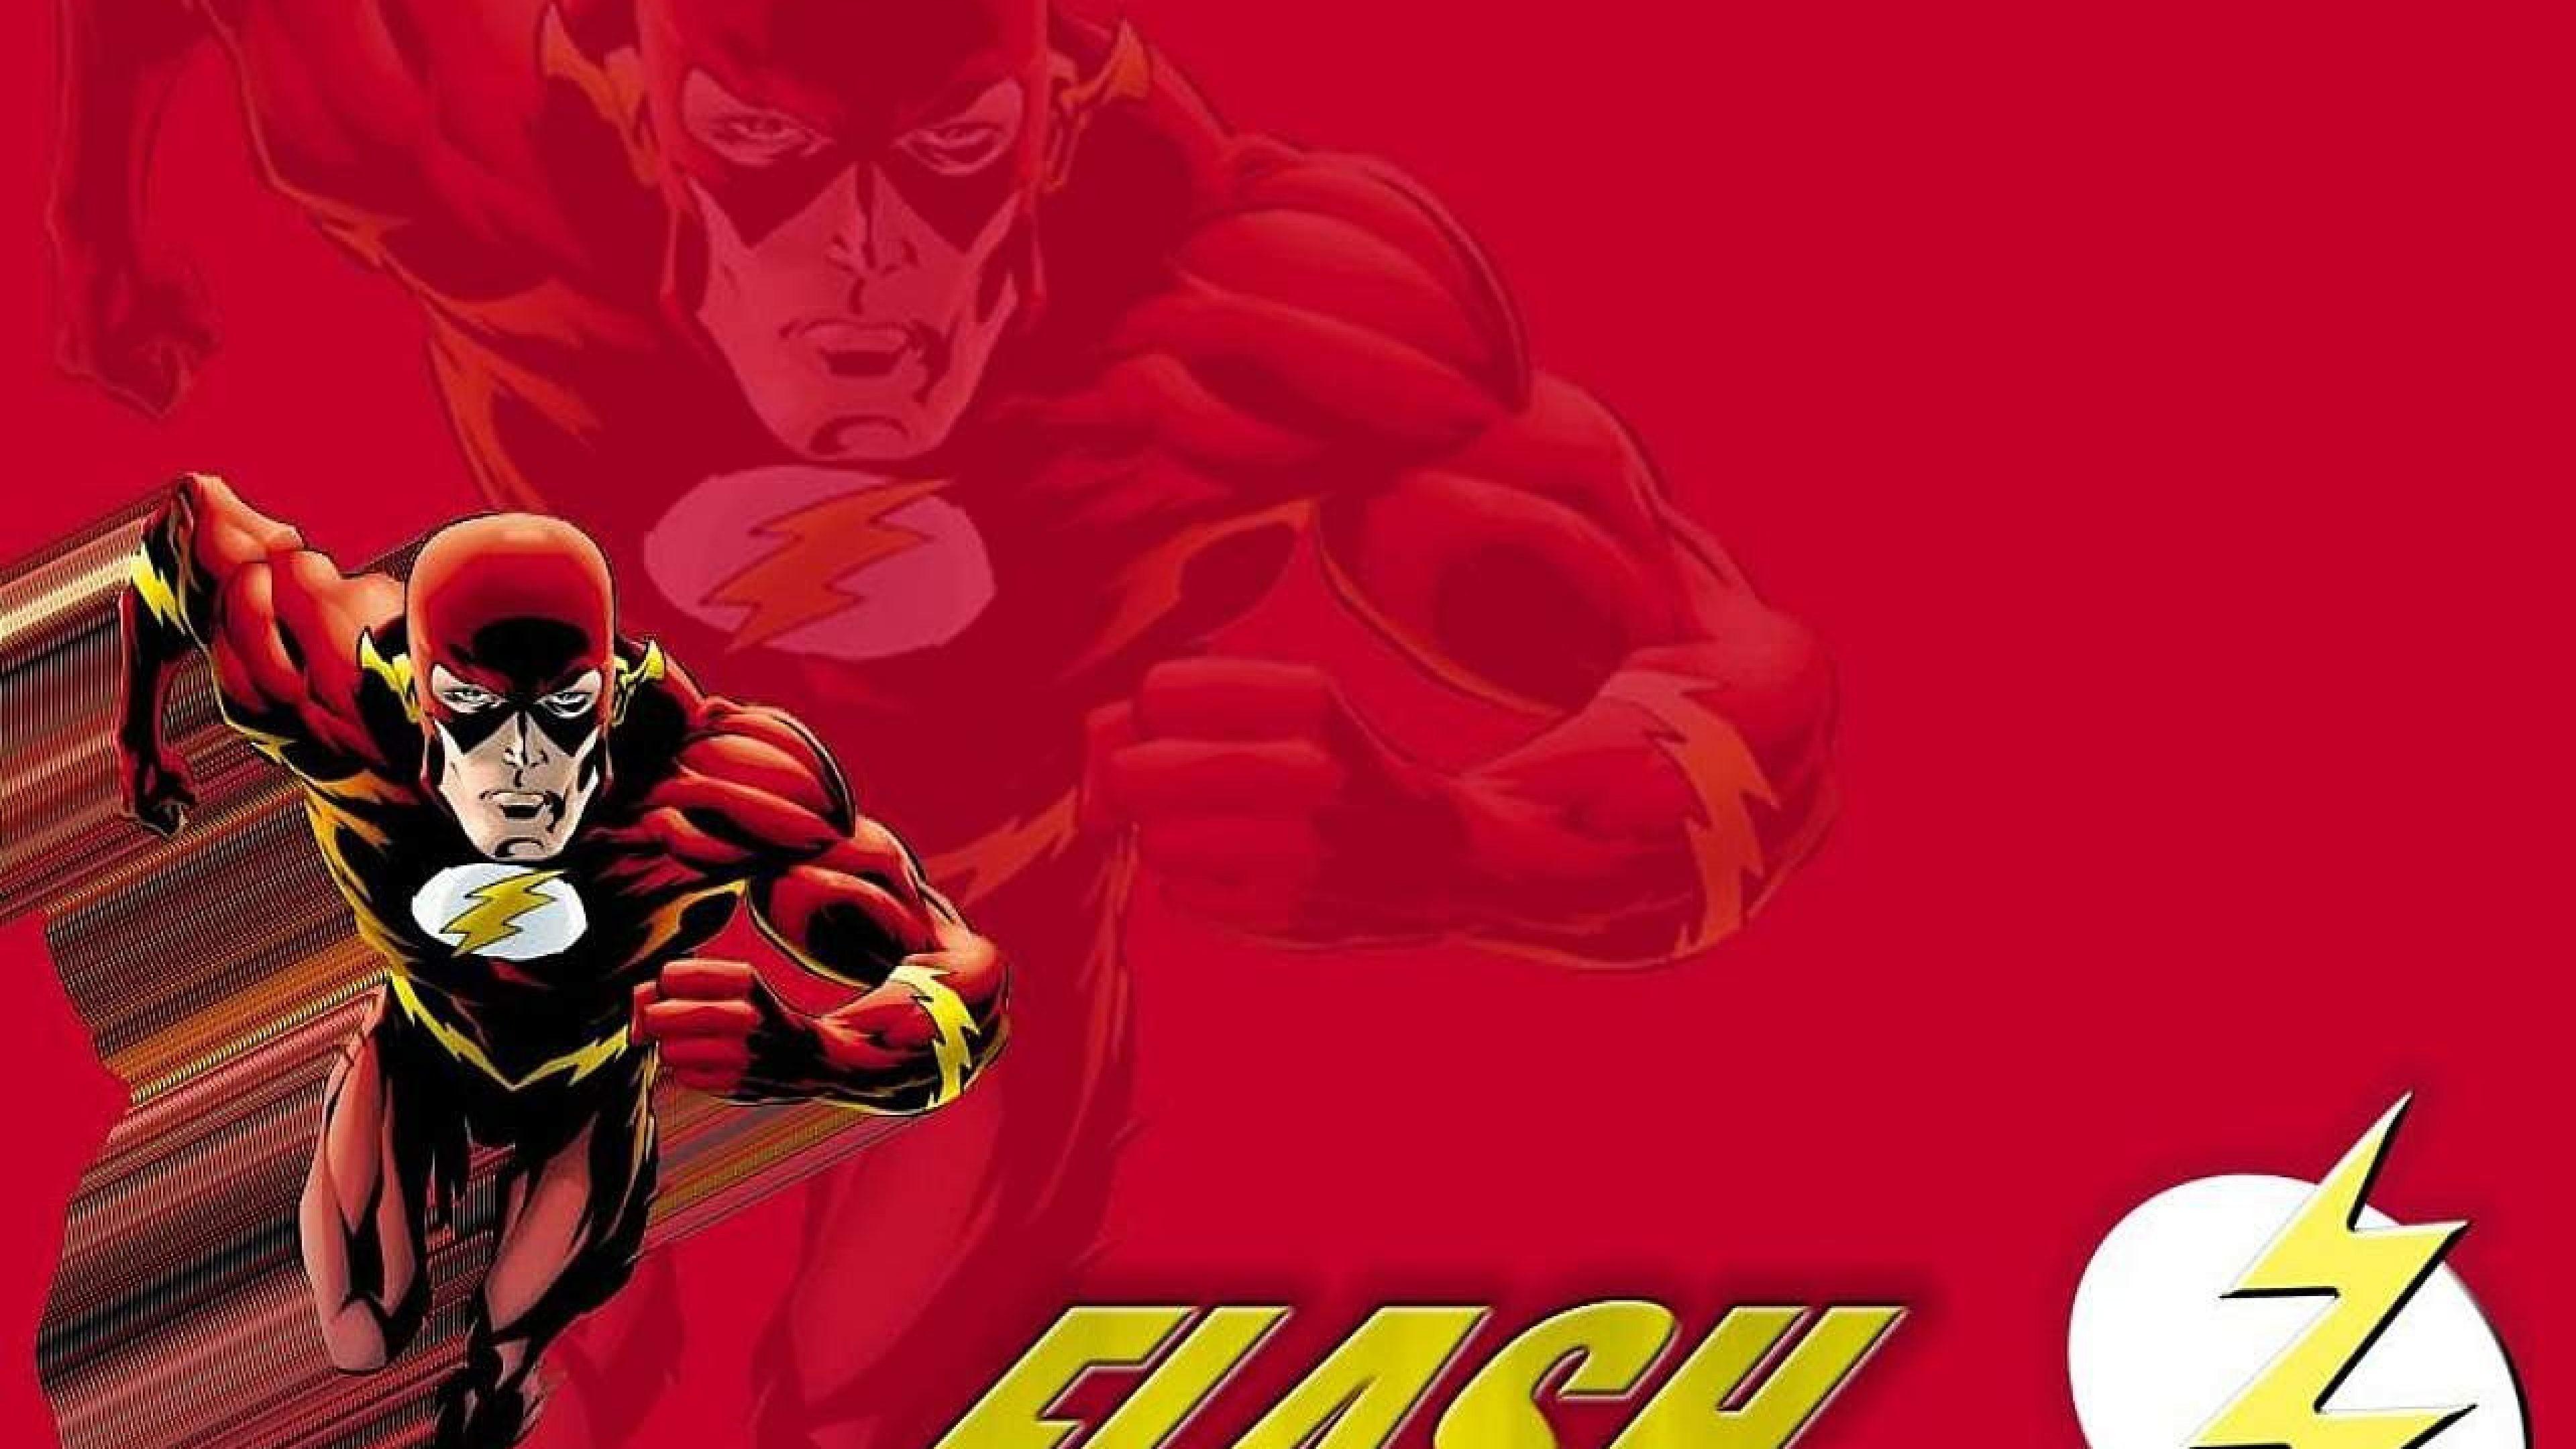 The Flash Desktop Wallpaper